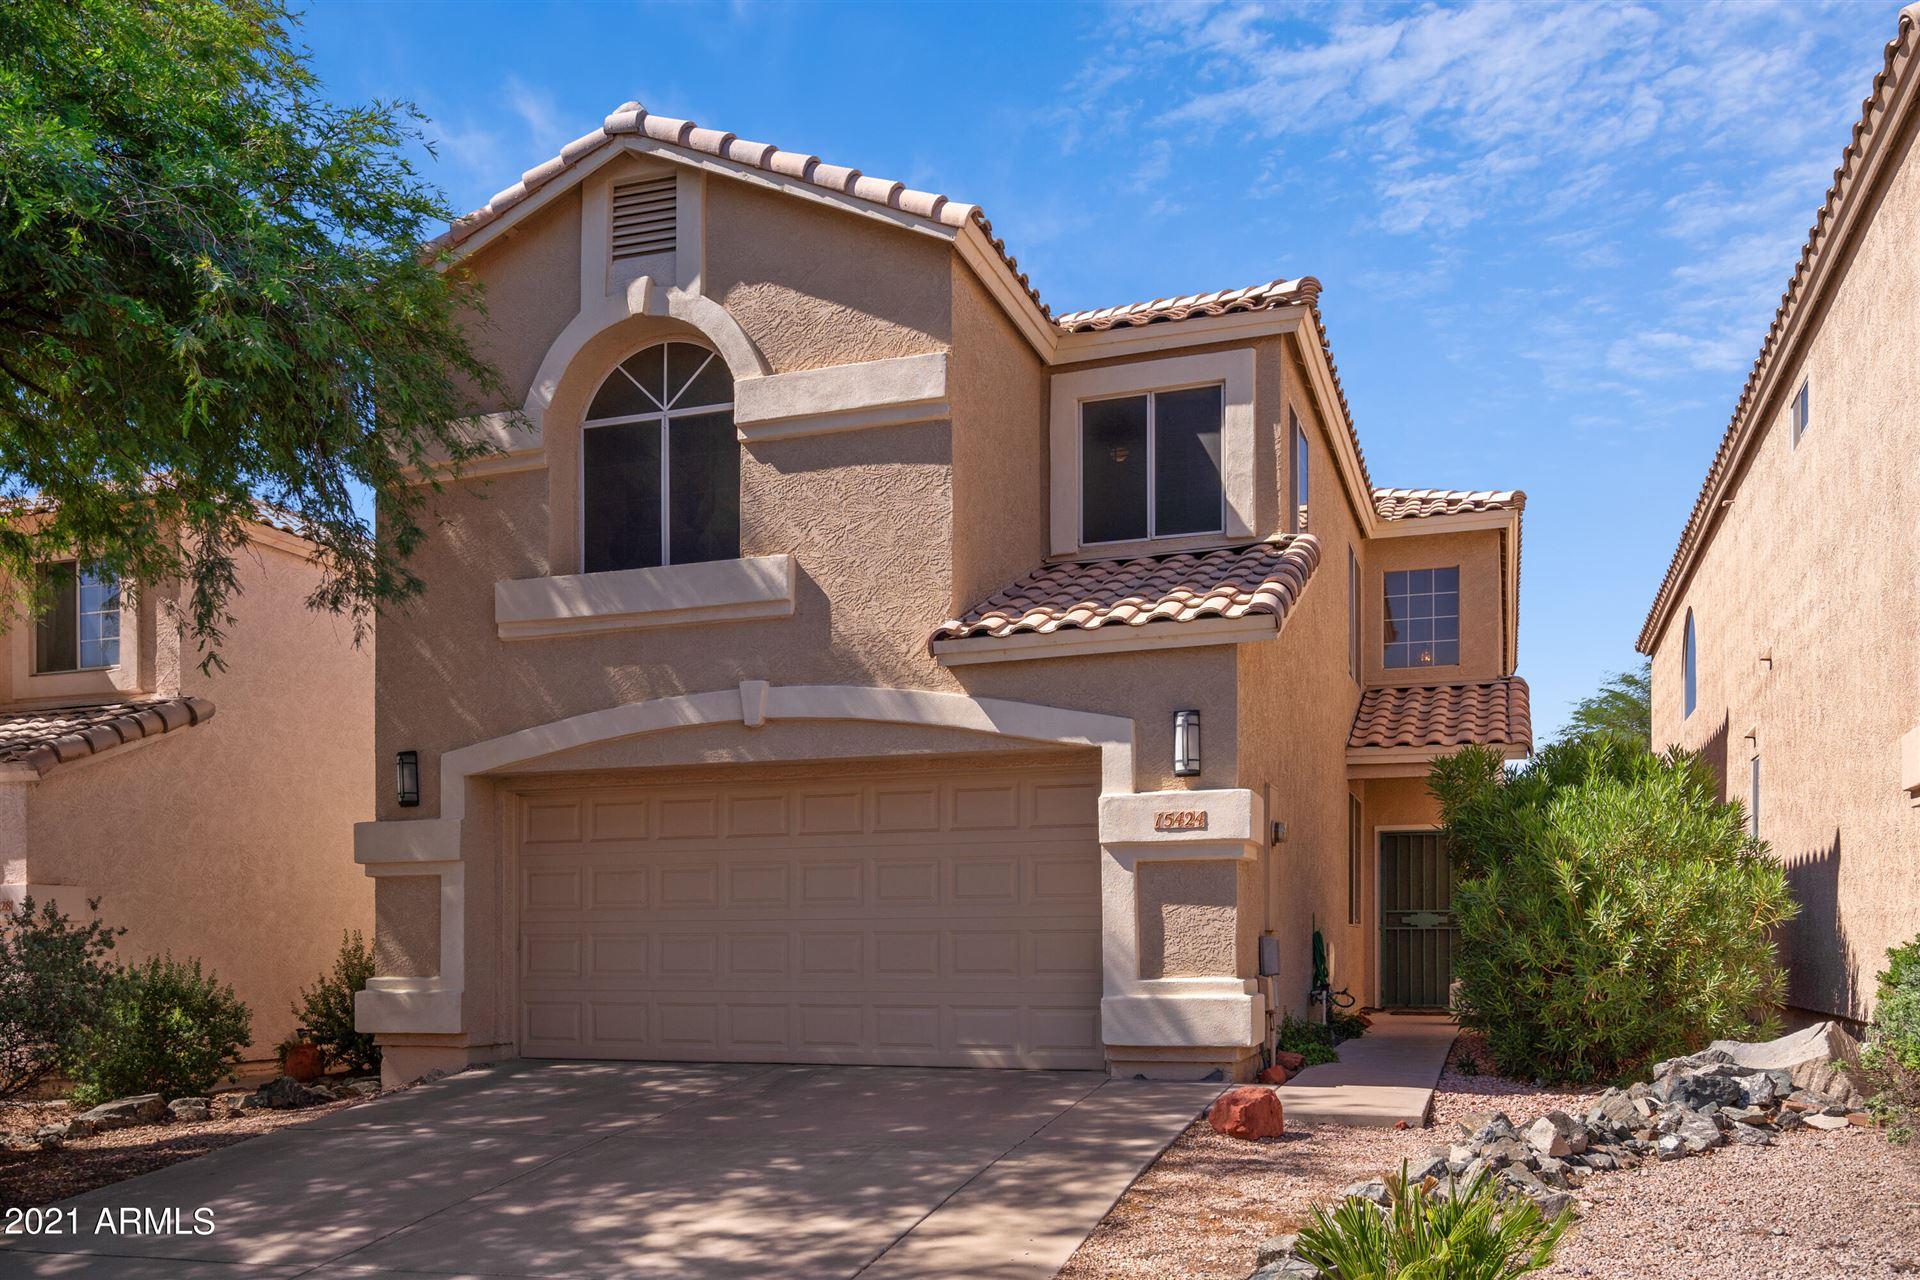 15424 S 14TH Place, Phoenix, AZ 85048 - MLS#: 6303330